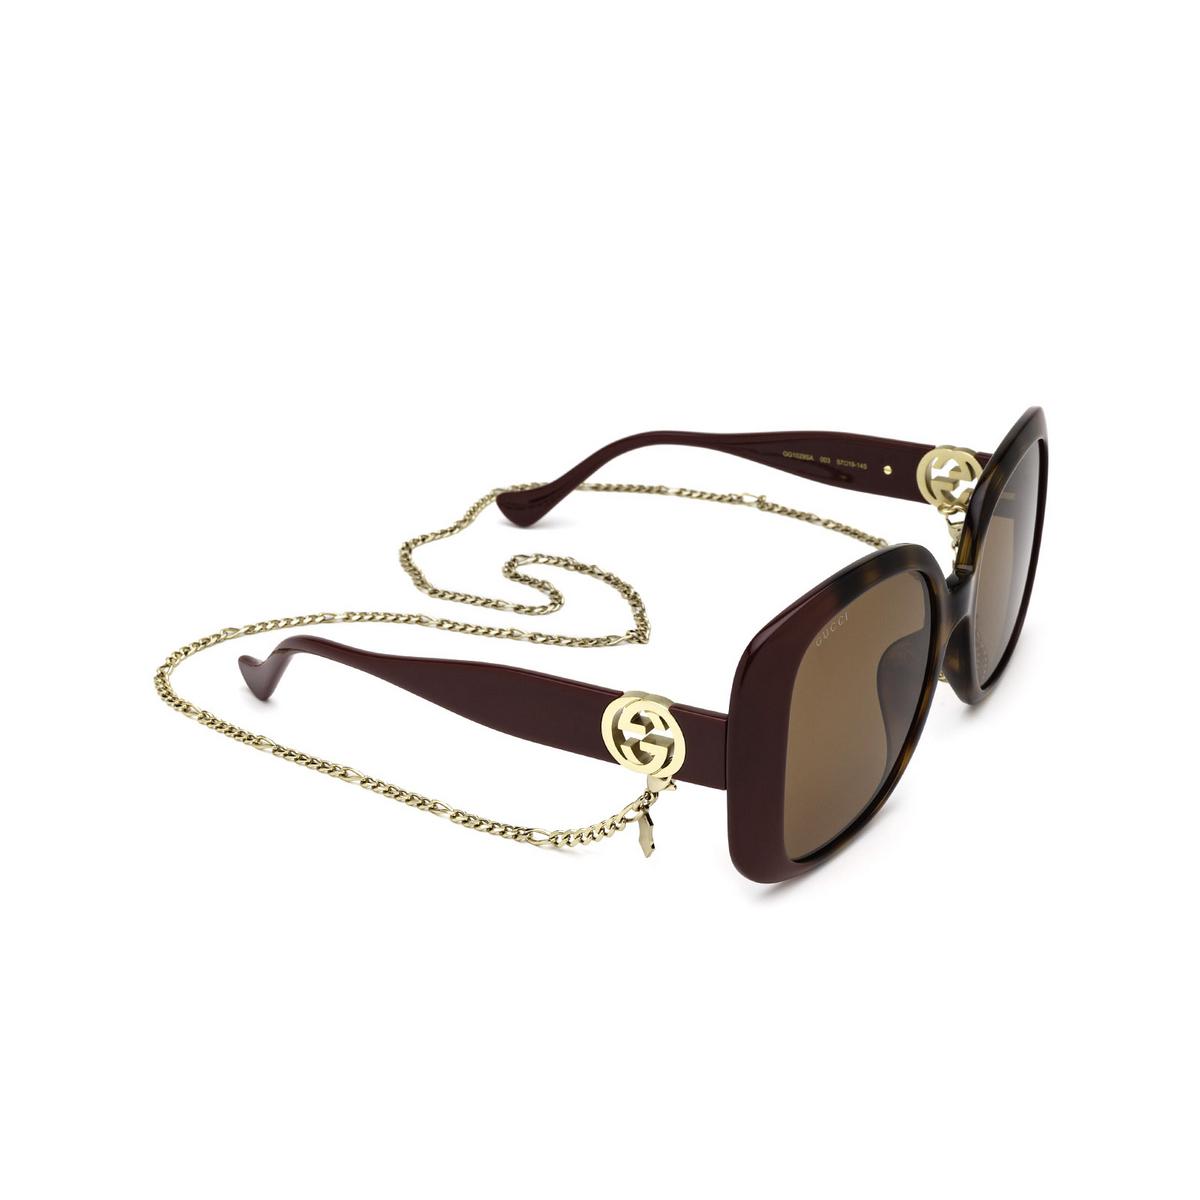 Gucci® Square Sunglasses: GG1029SA color Havana & Burgundy 003 - three-quarters view.